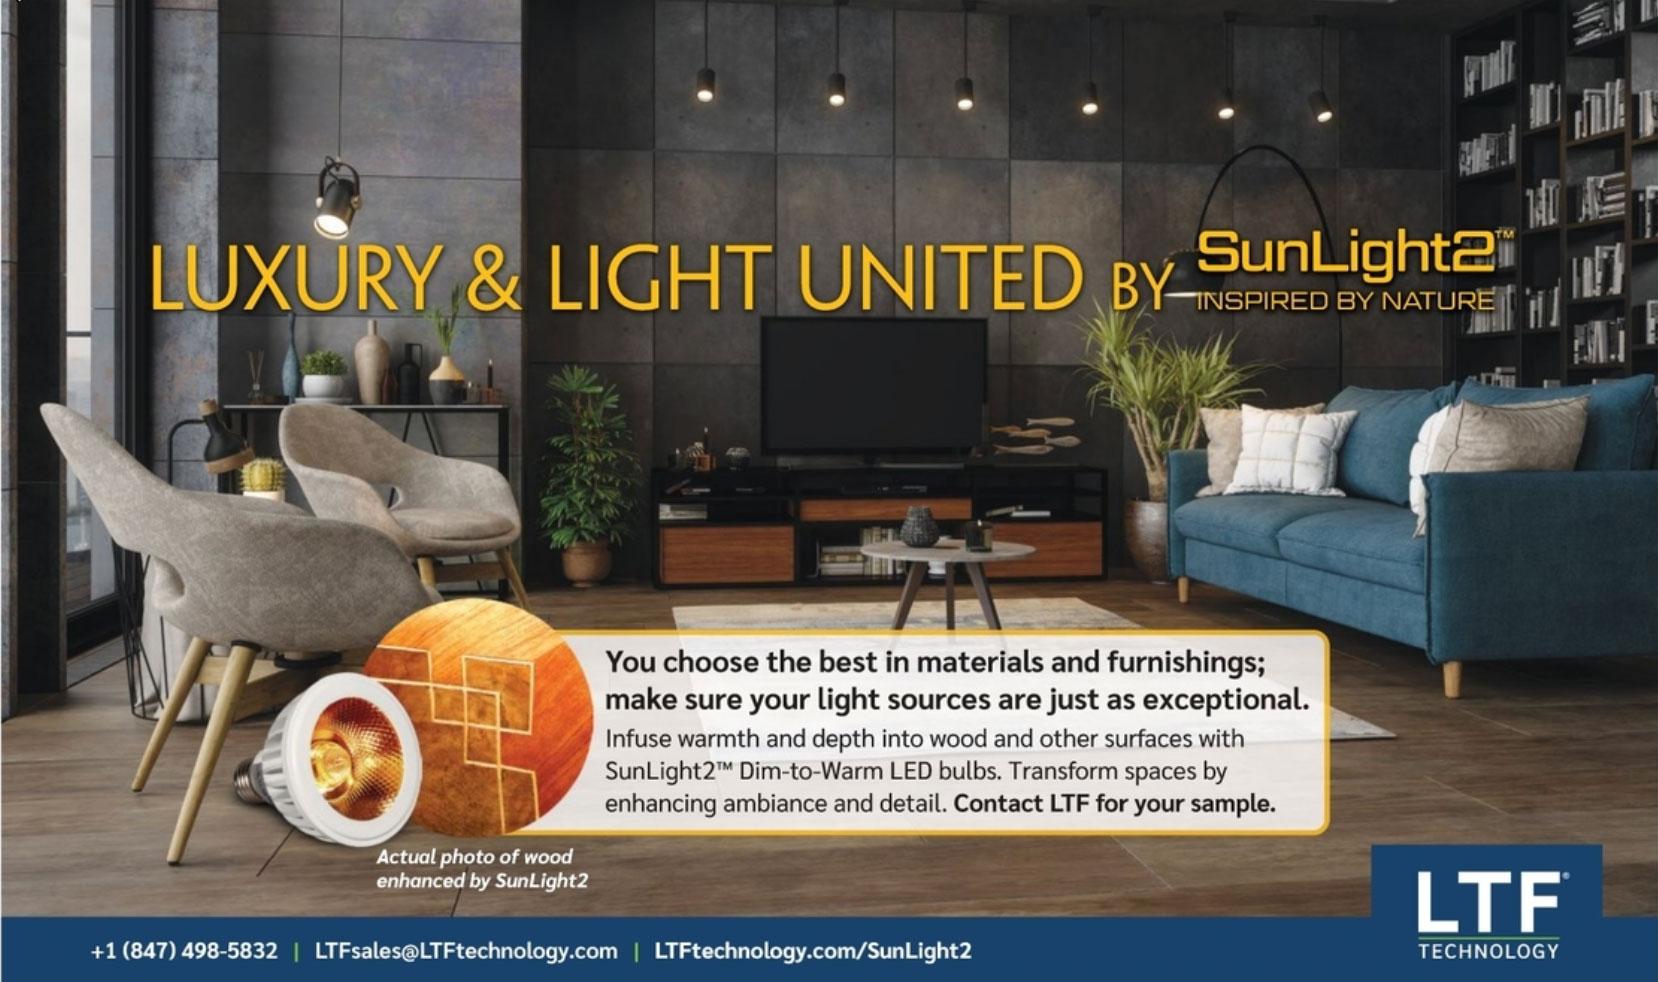 SunLight2 ad